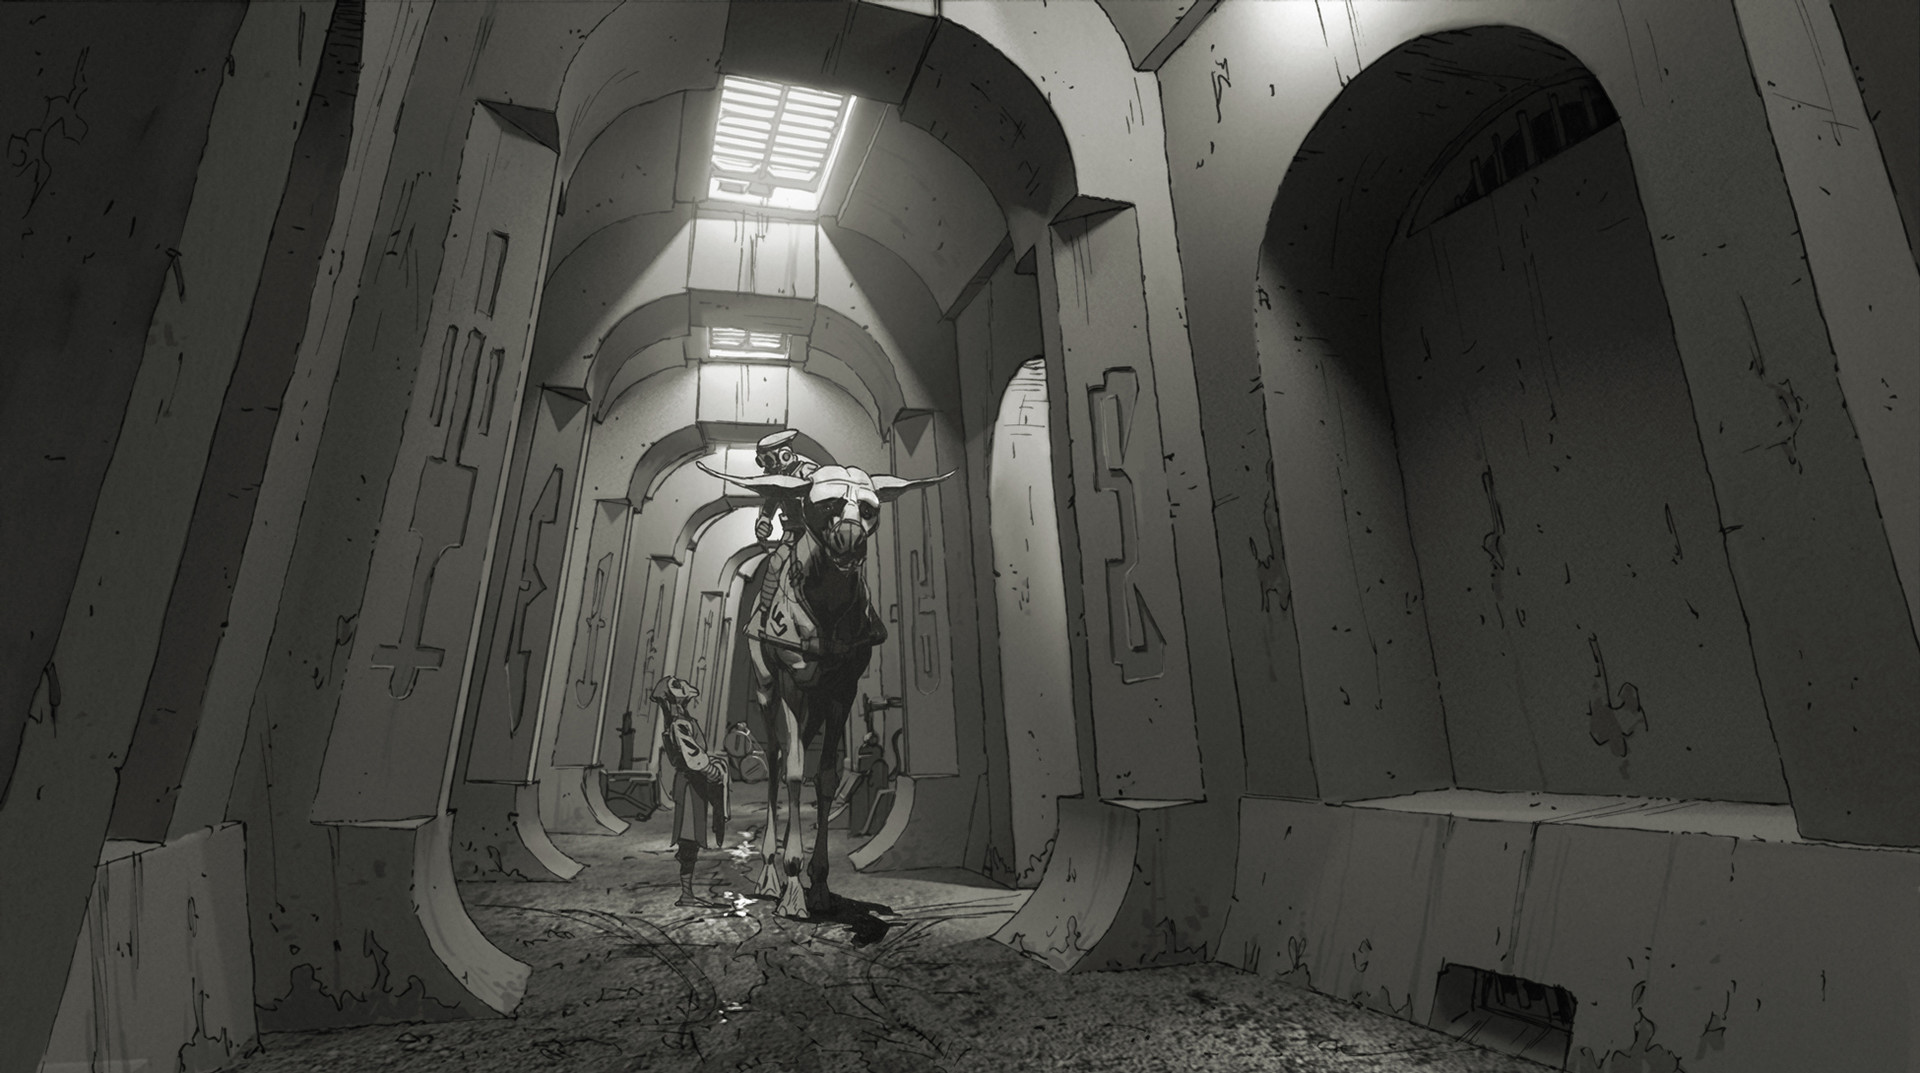 Rodolfo damaggio reversehound art